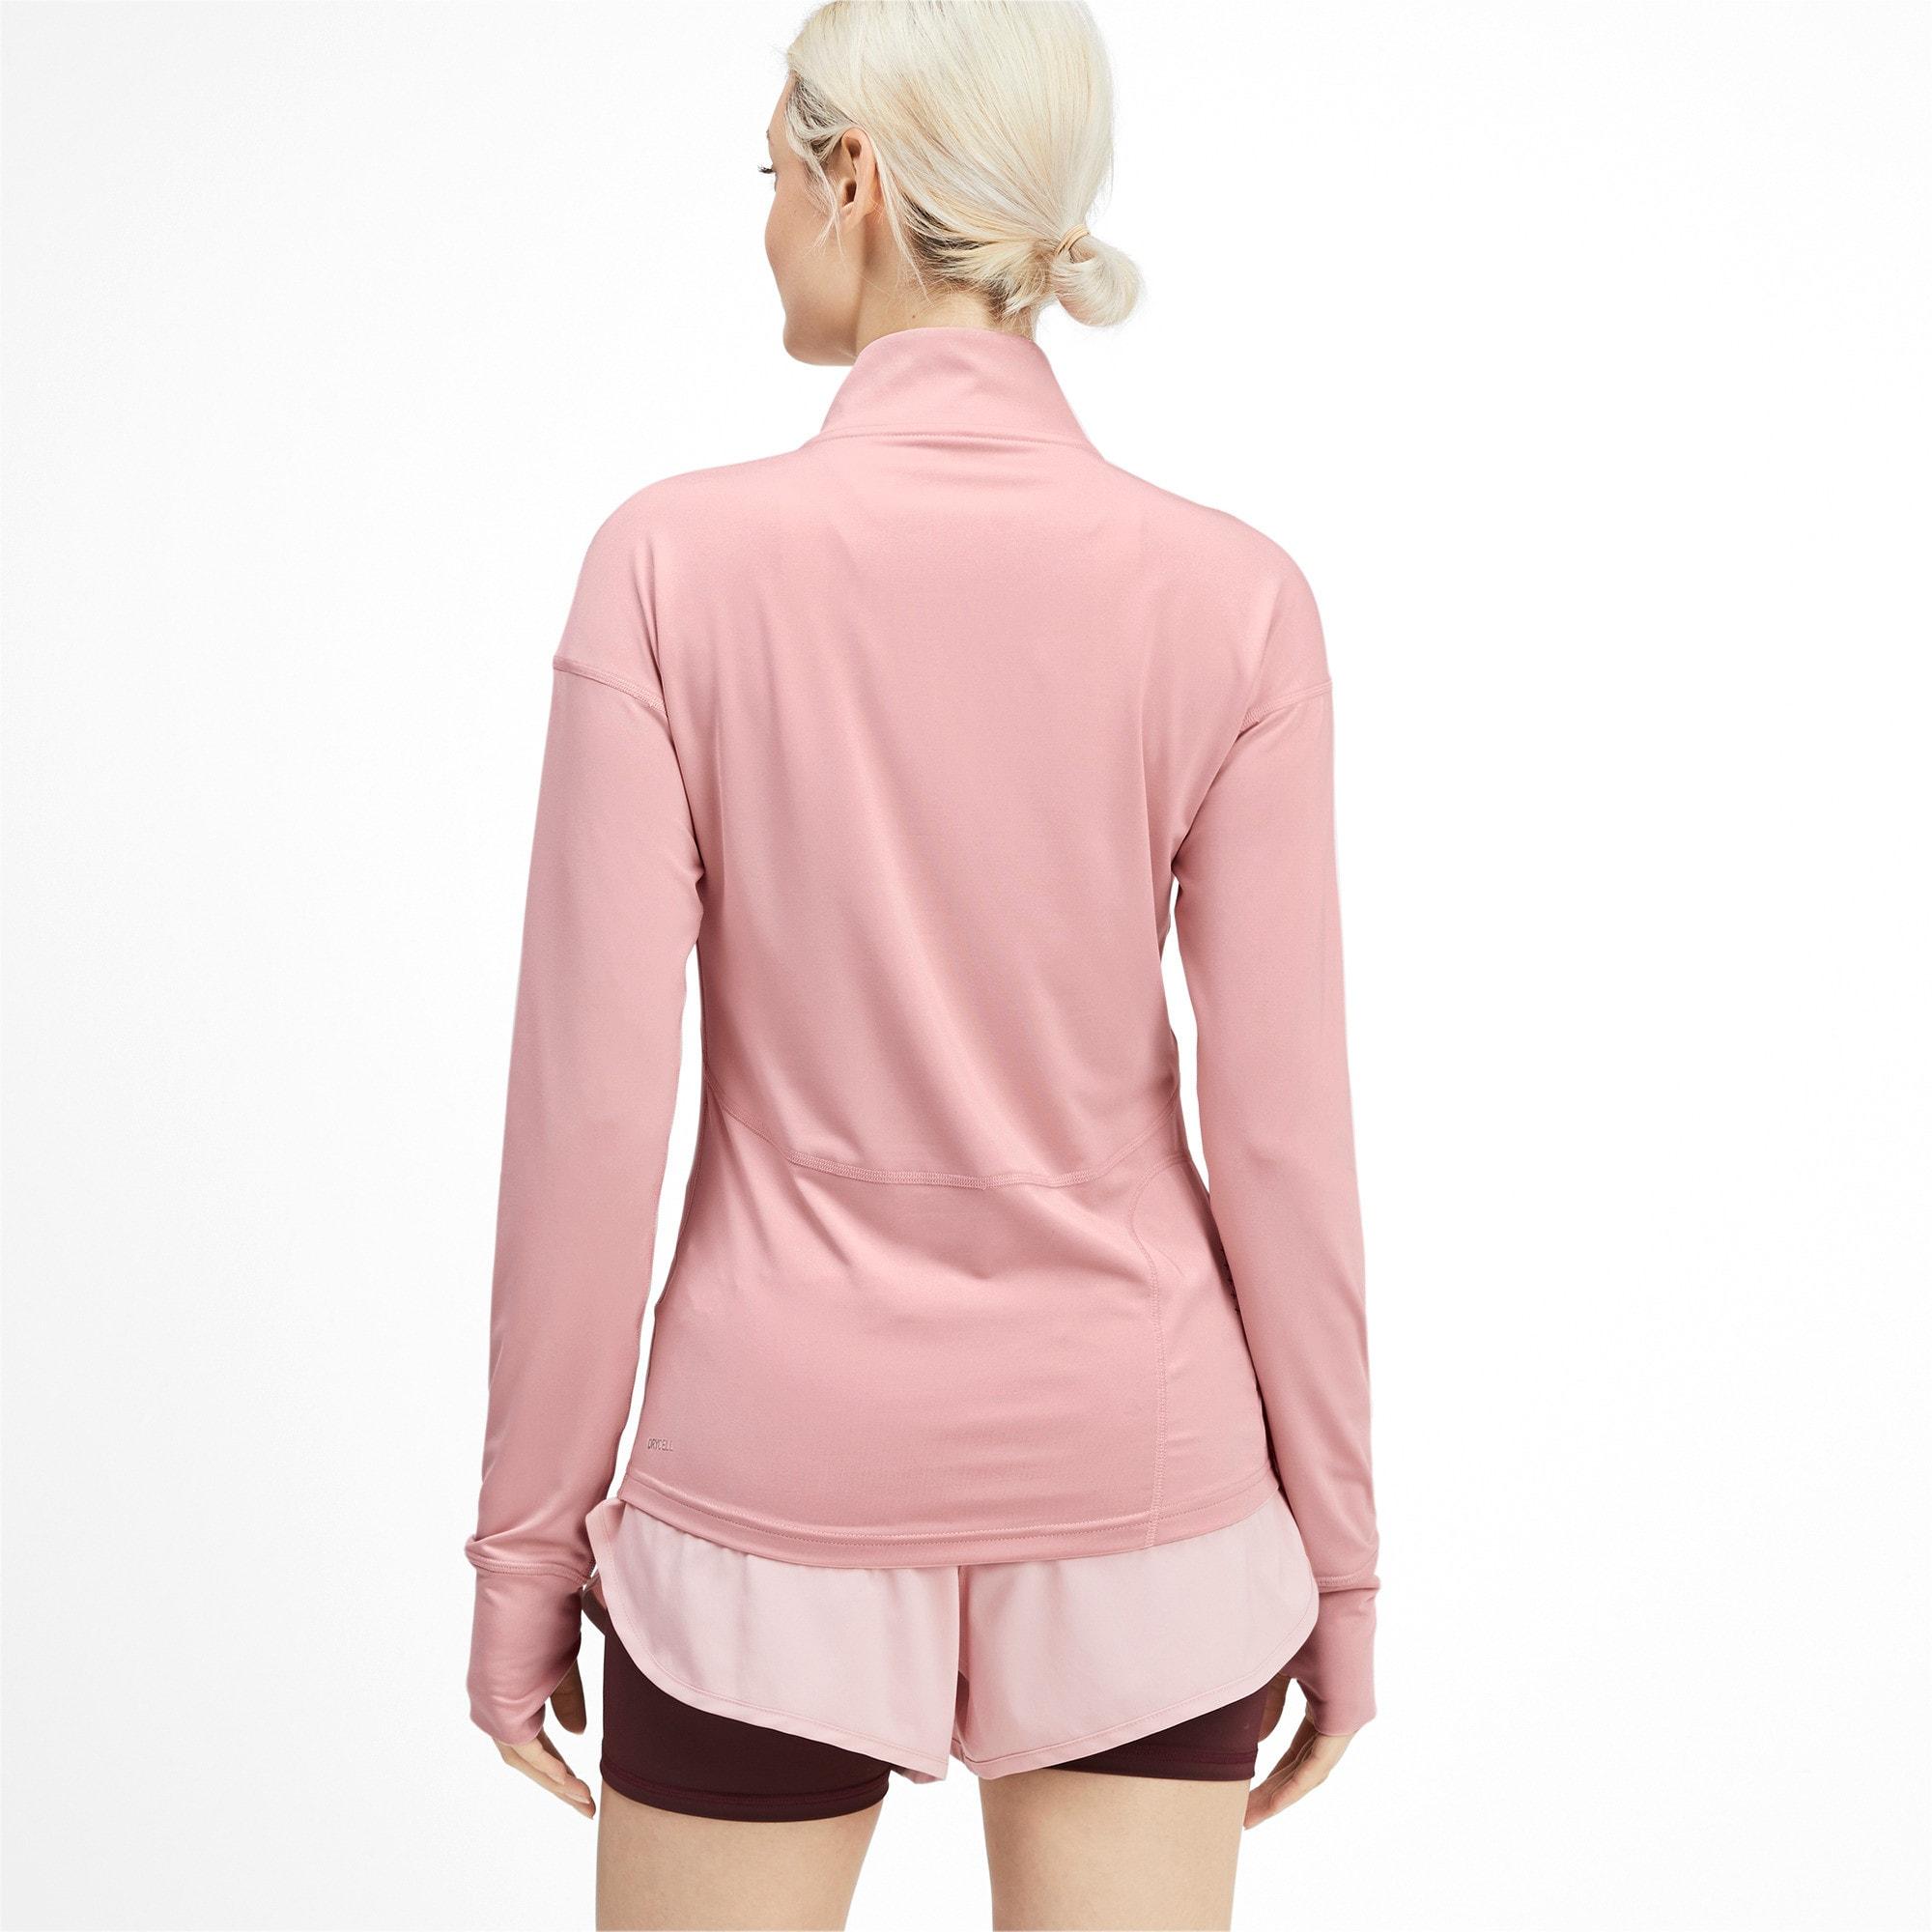 Thumbnail 2 of Ignite Long Sleeve Women's Running Pullover, Bridal Rose, medium